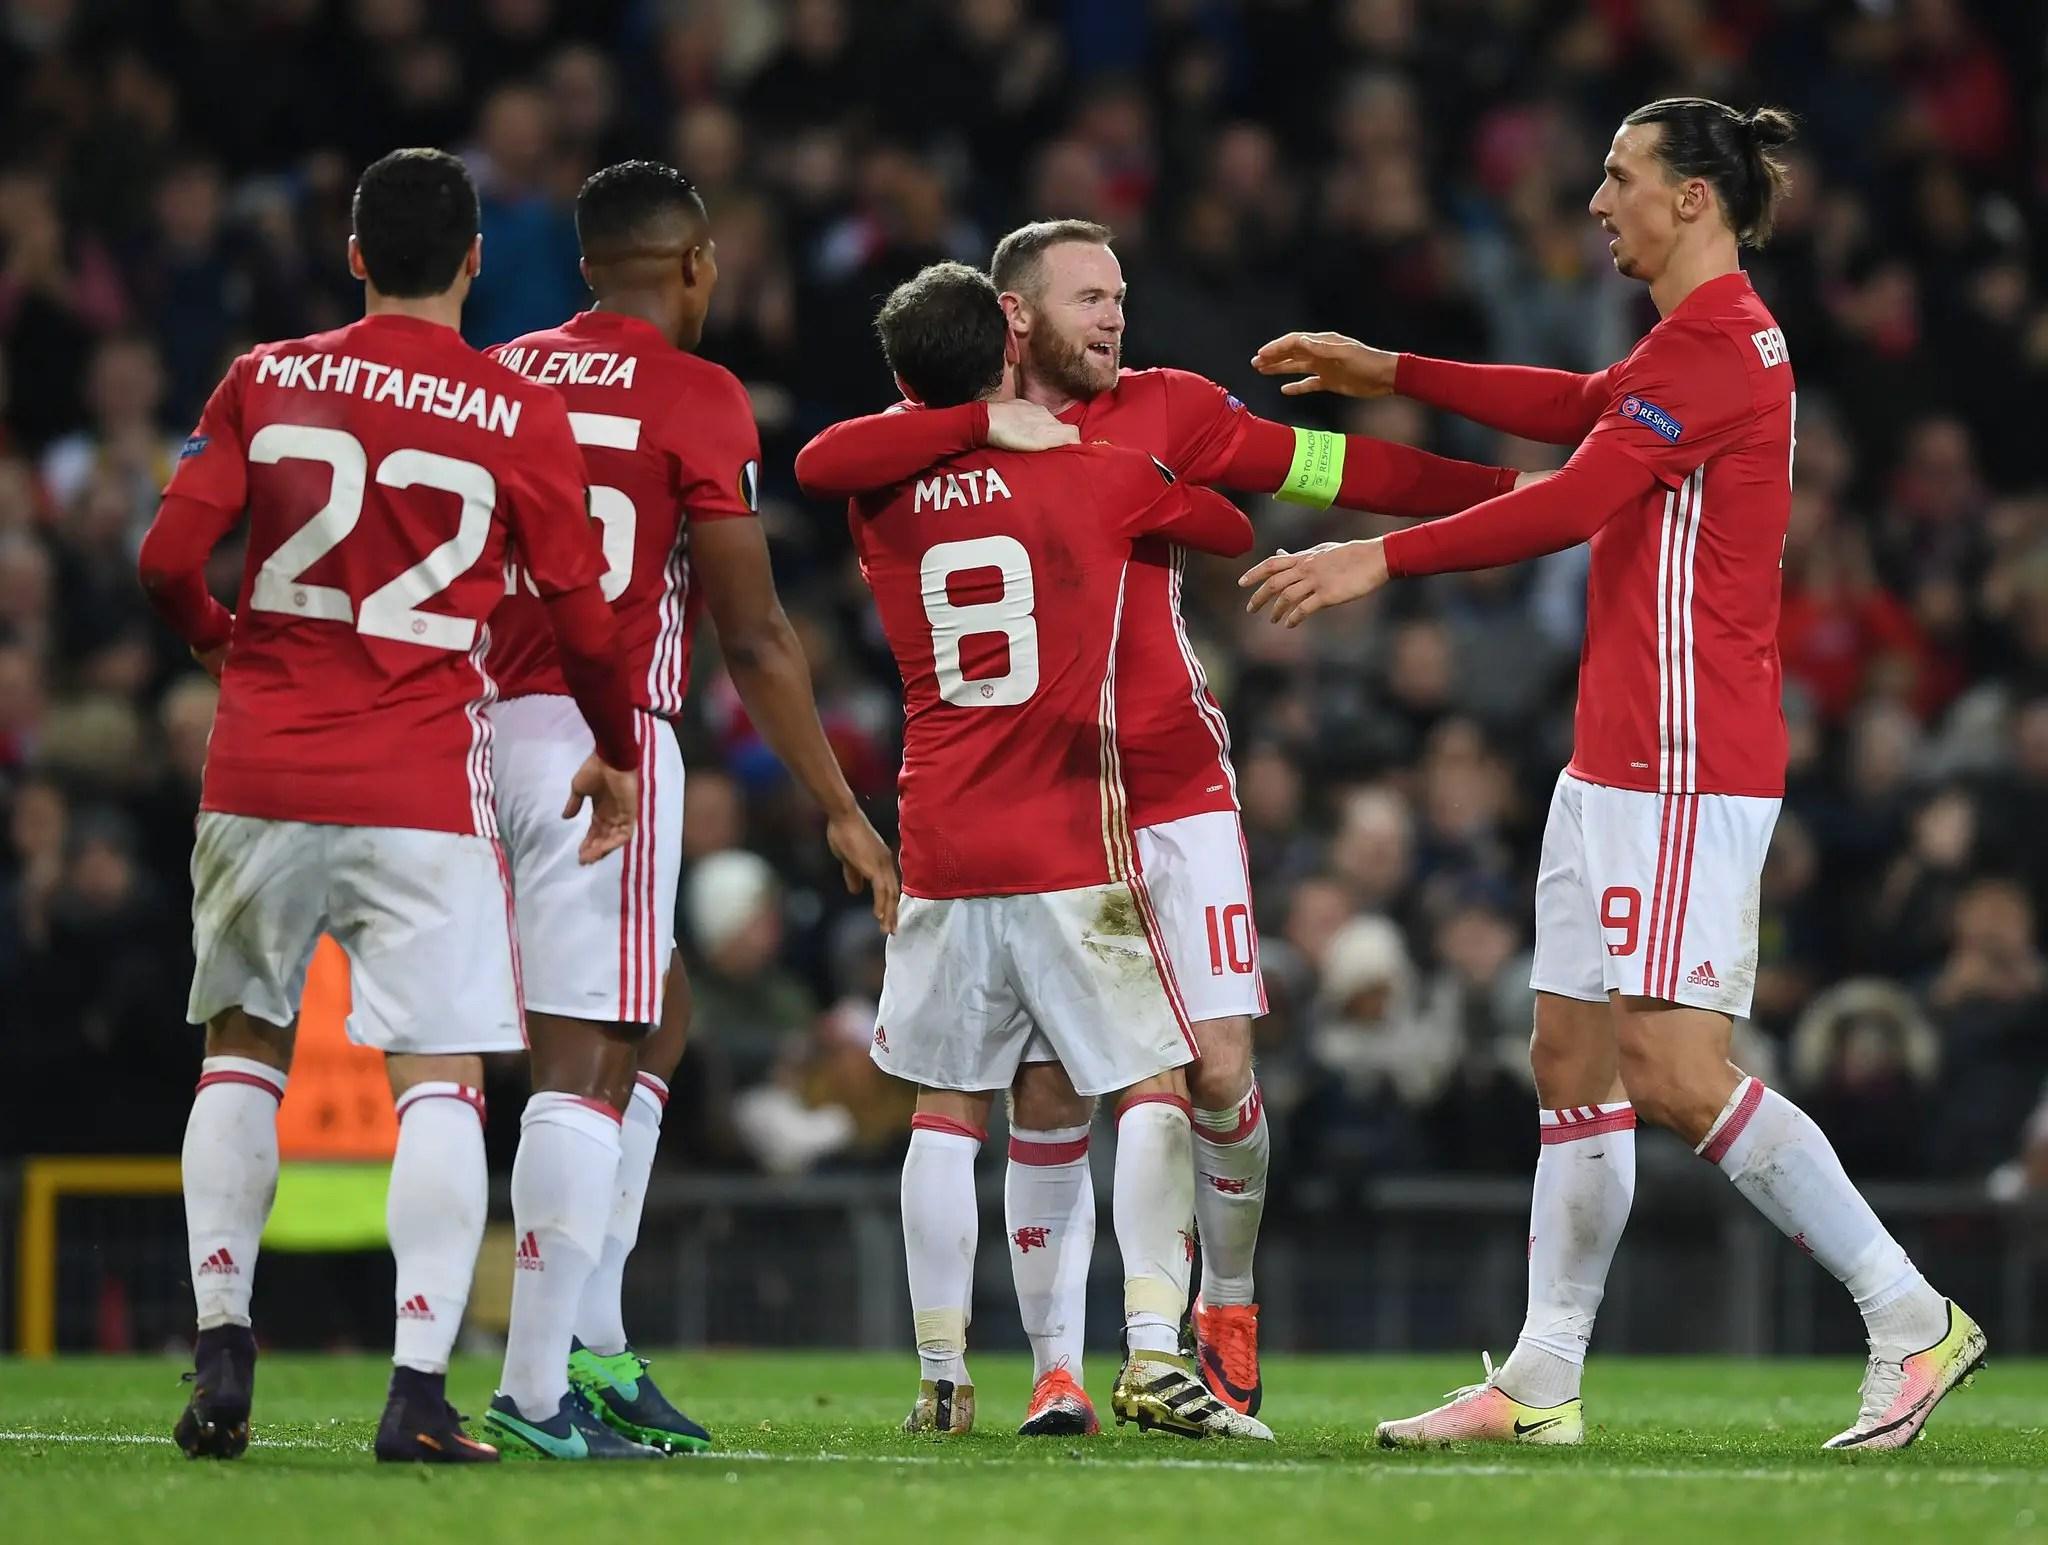 Europa: Rooney, Mata Fire United Past Feyenoord; Ideye, Balogun Shine